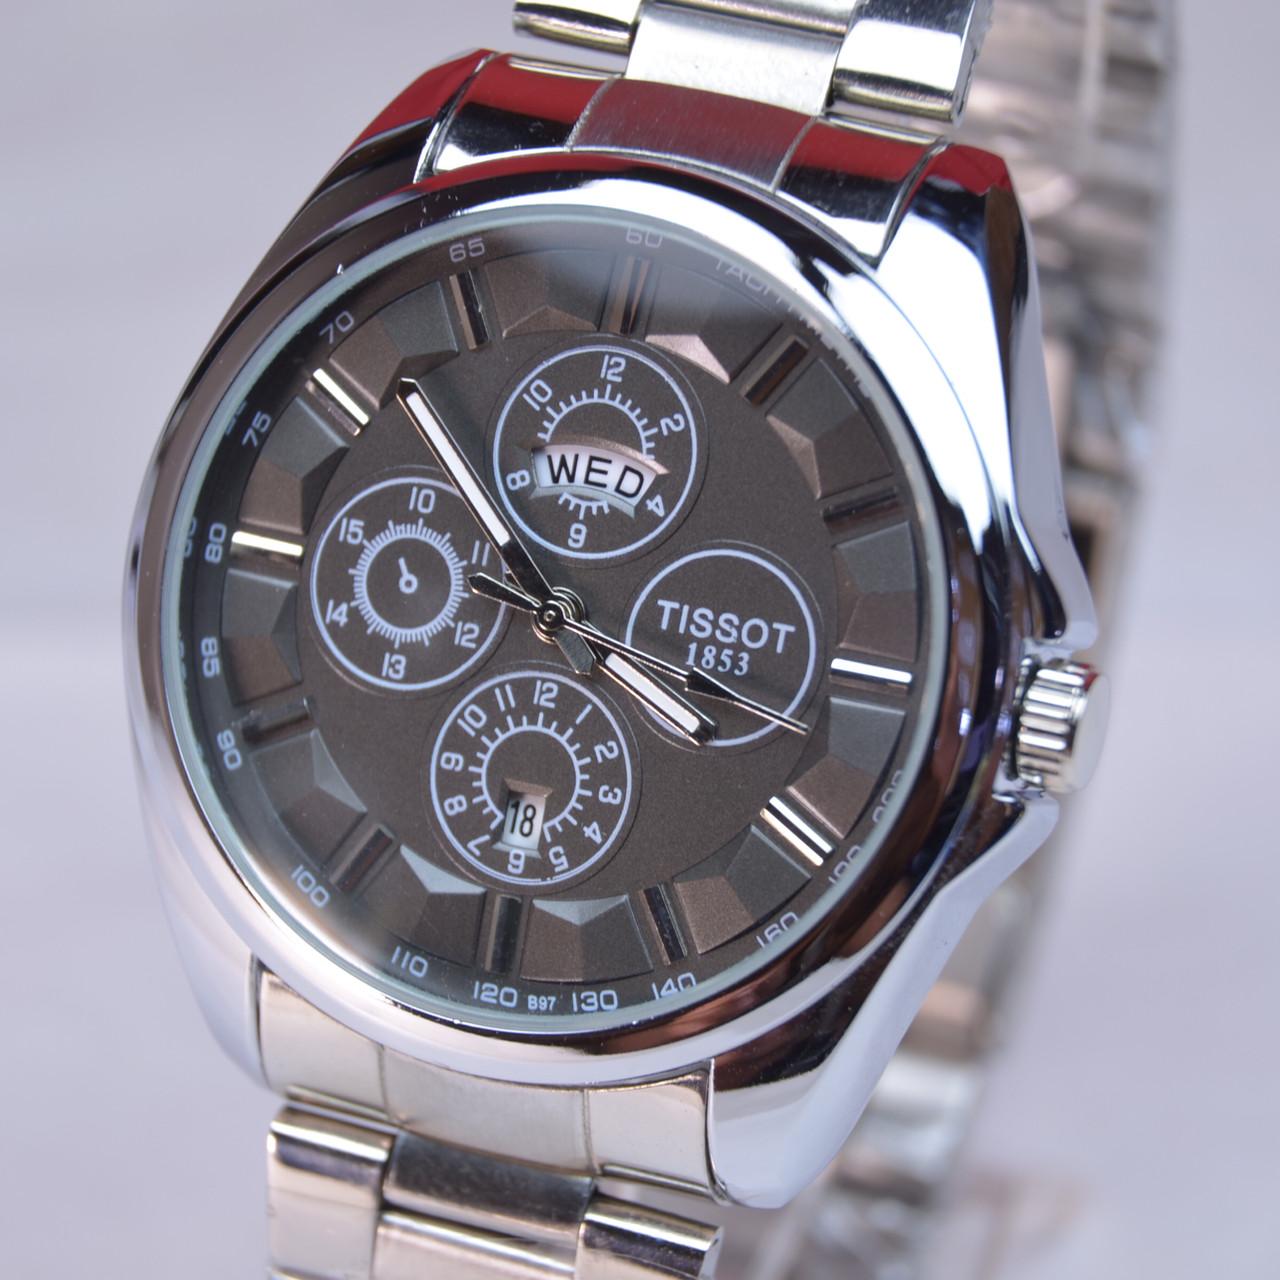 Мужские наручные часы TISSOT Couturier T035 копия